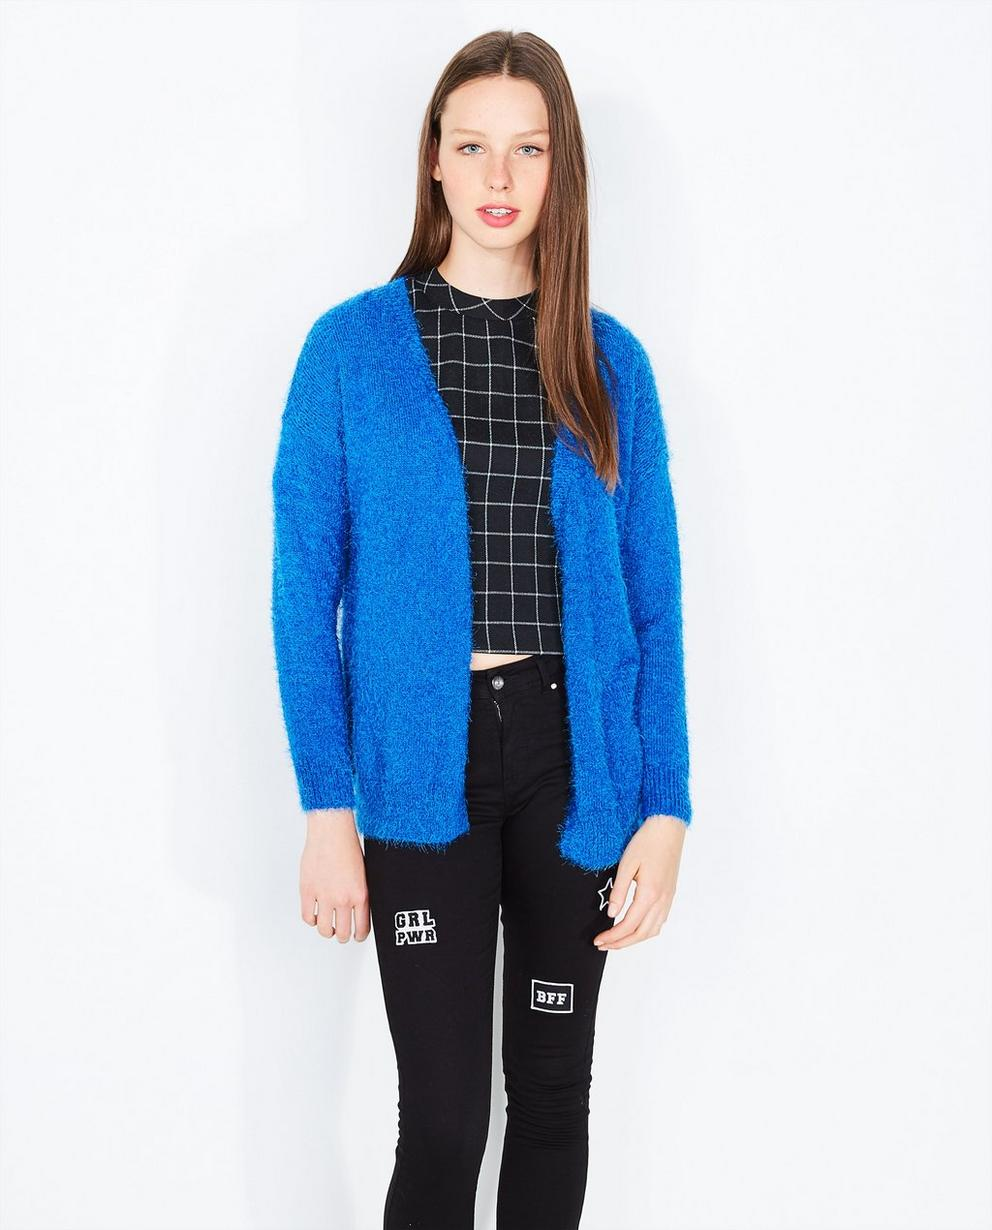 Felblauw harig vest - lichtjes oversized - Grogy